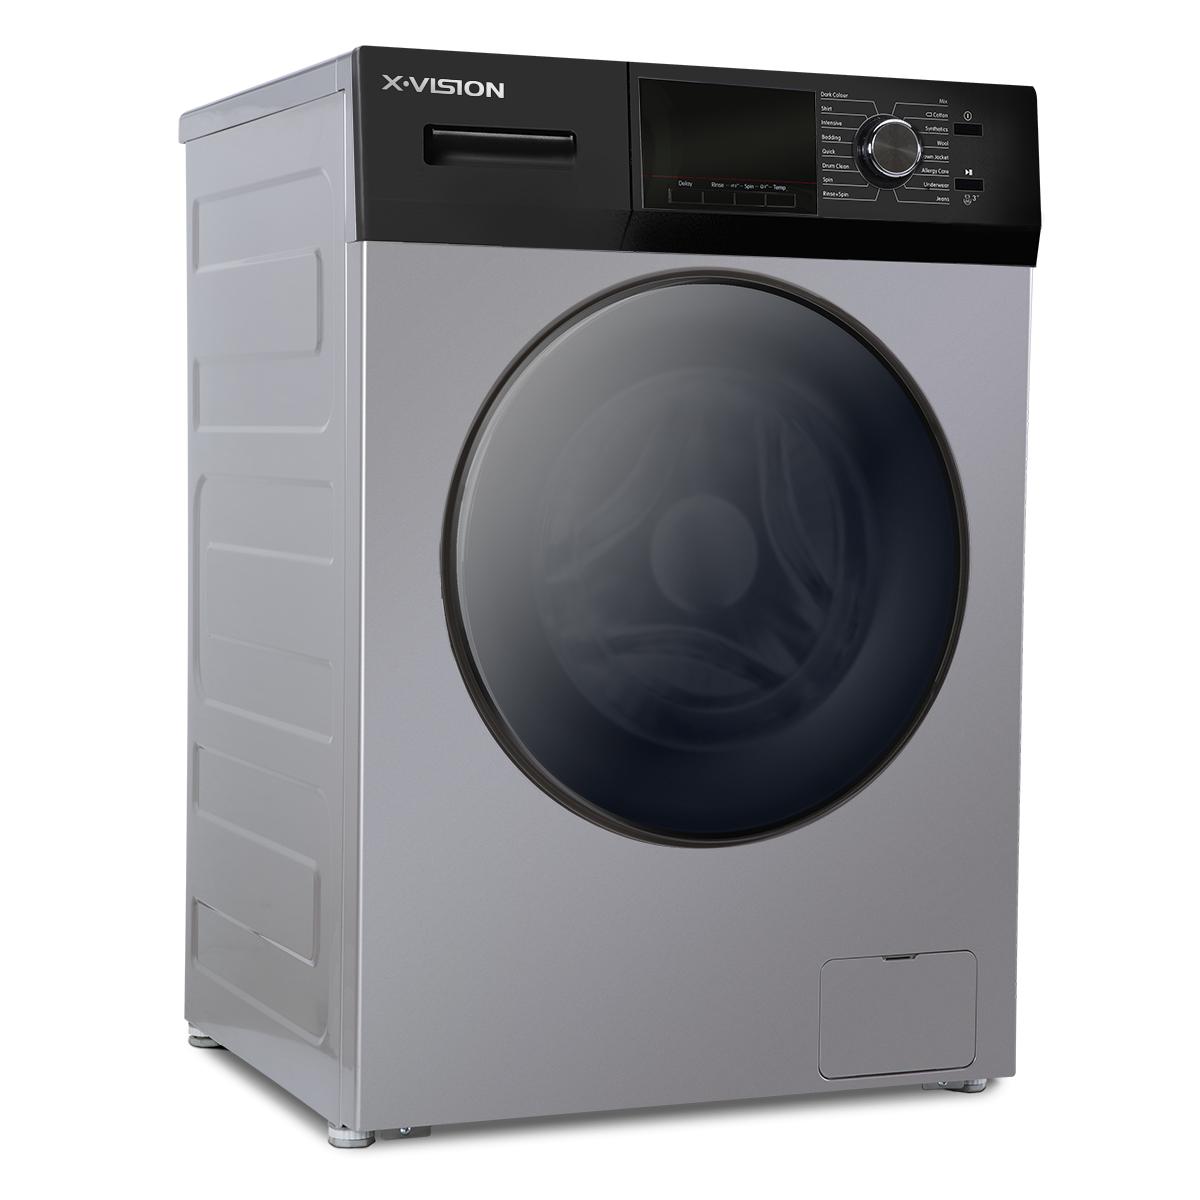 ماشین لباسشویی ایکس ویژن مدل TM84-BWBL/BSBL ظرفیت 8 کیلوگرم